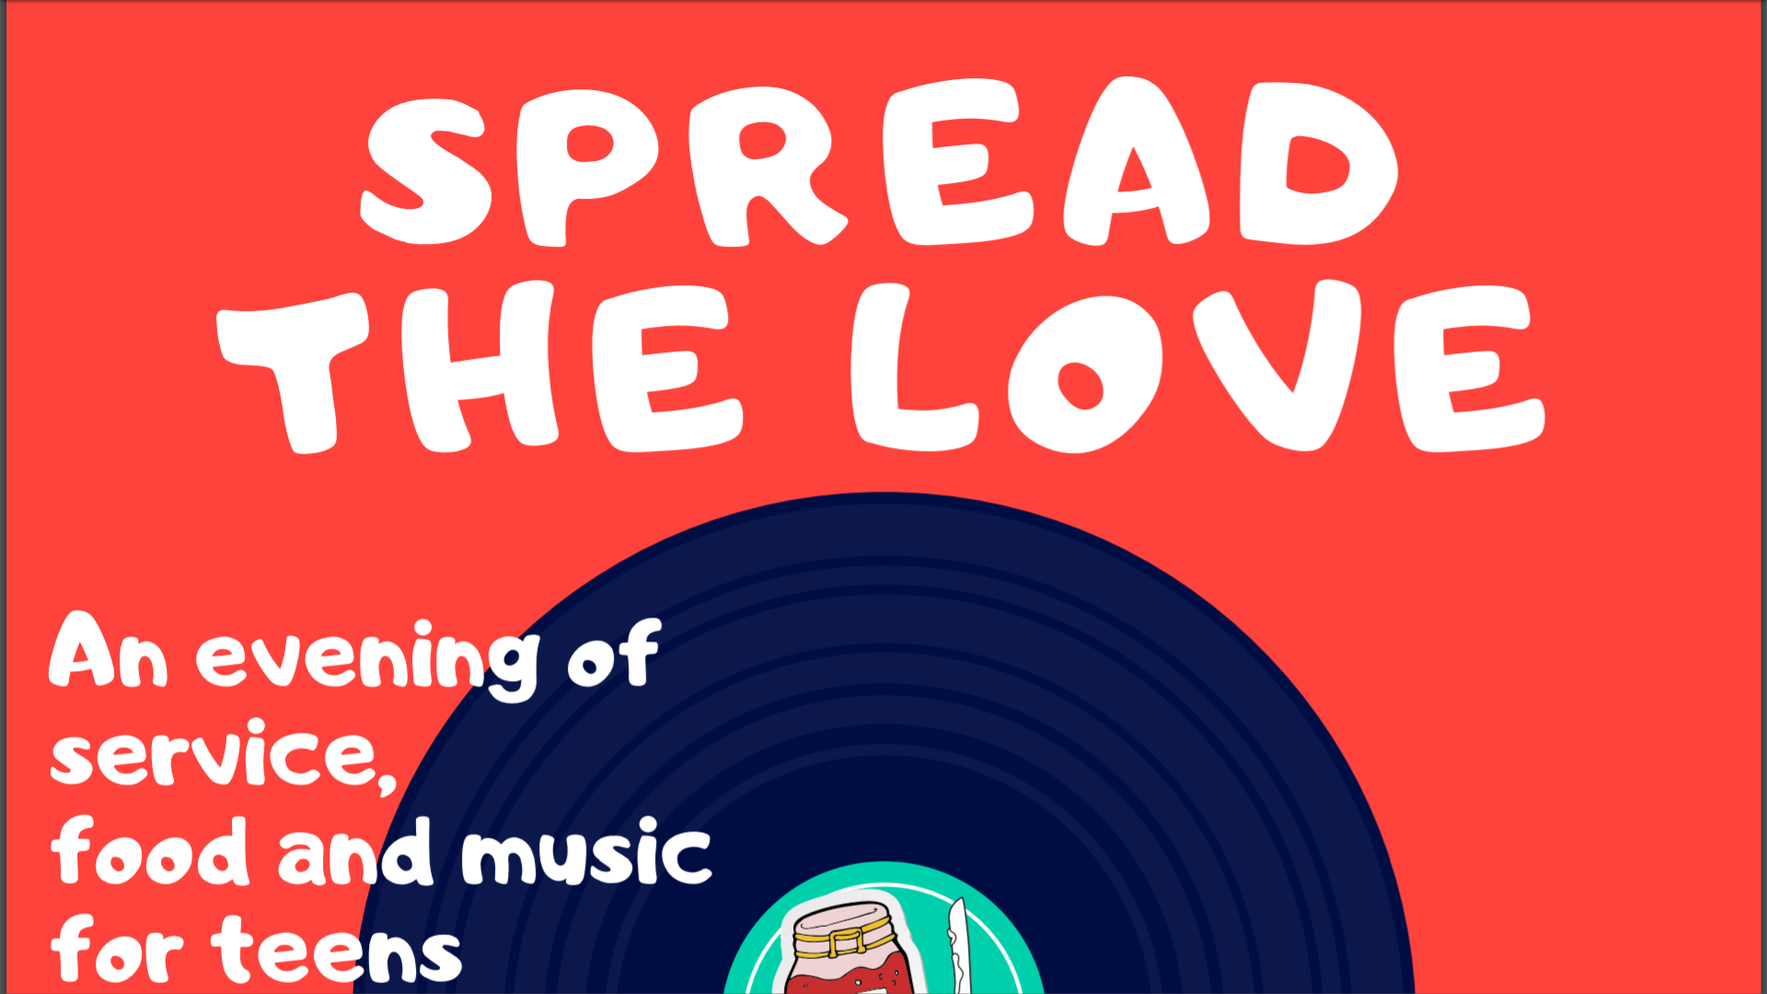 Spread the Love image